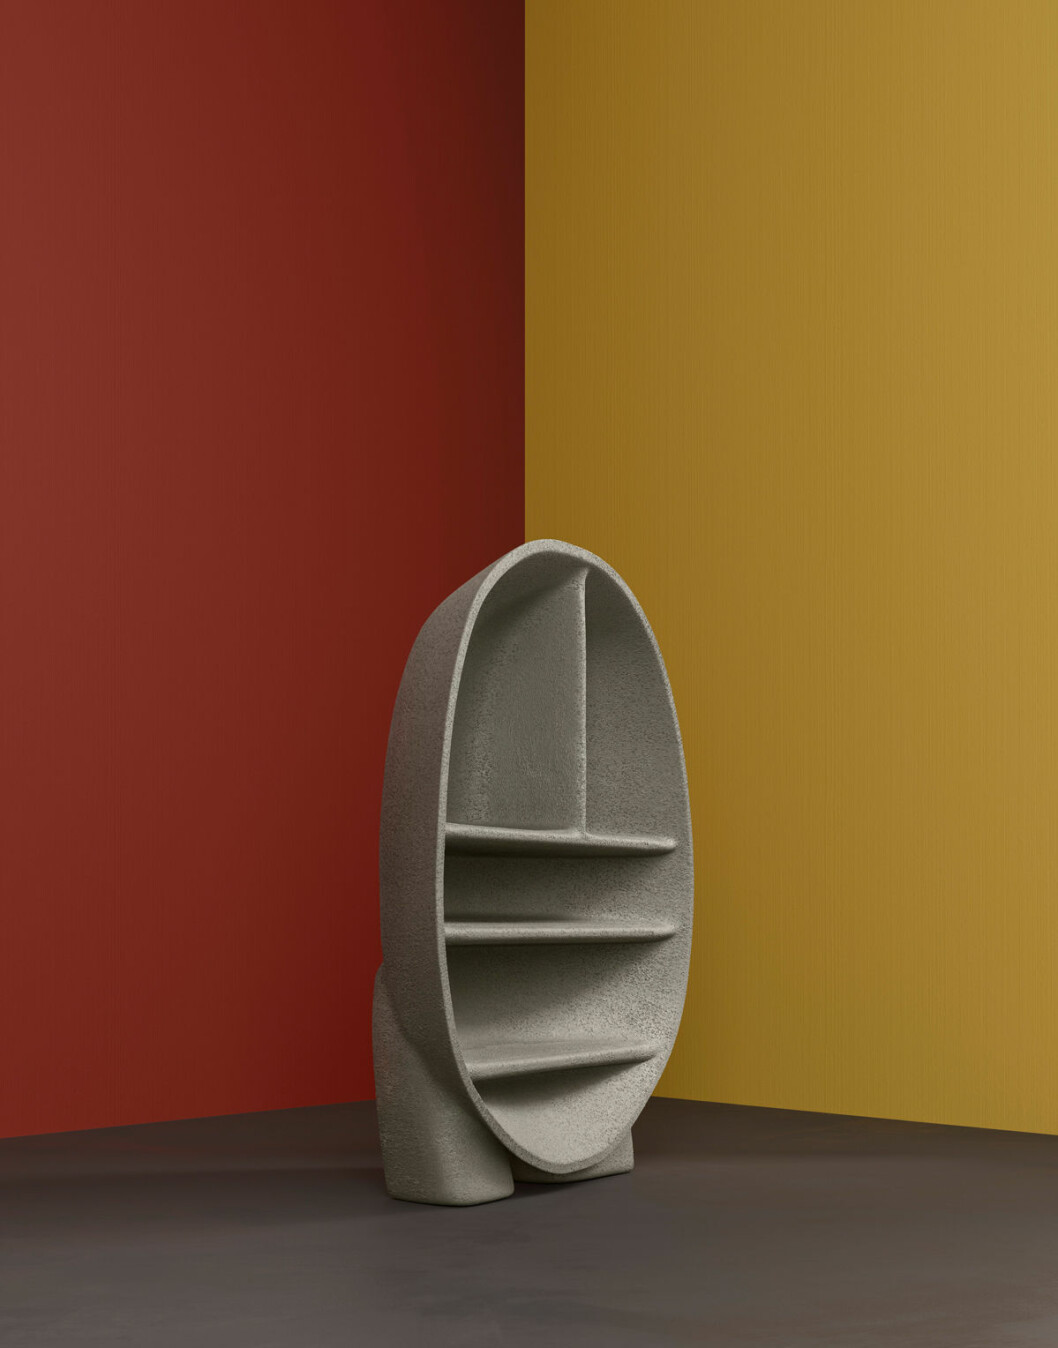 Edida 2020 vinnare furniture